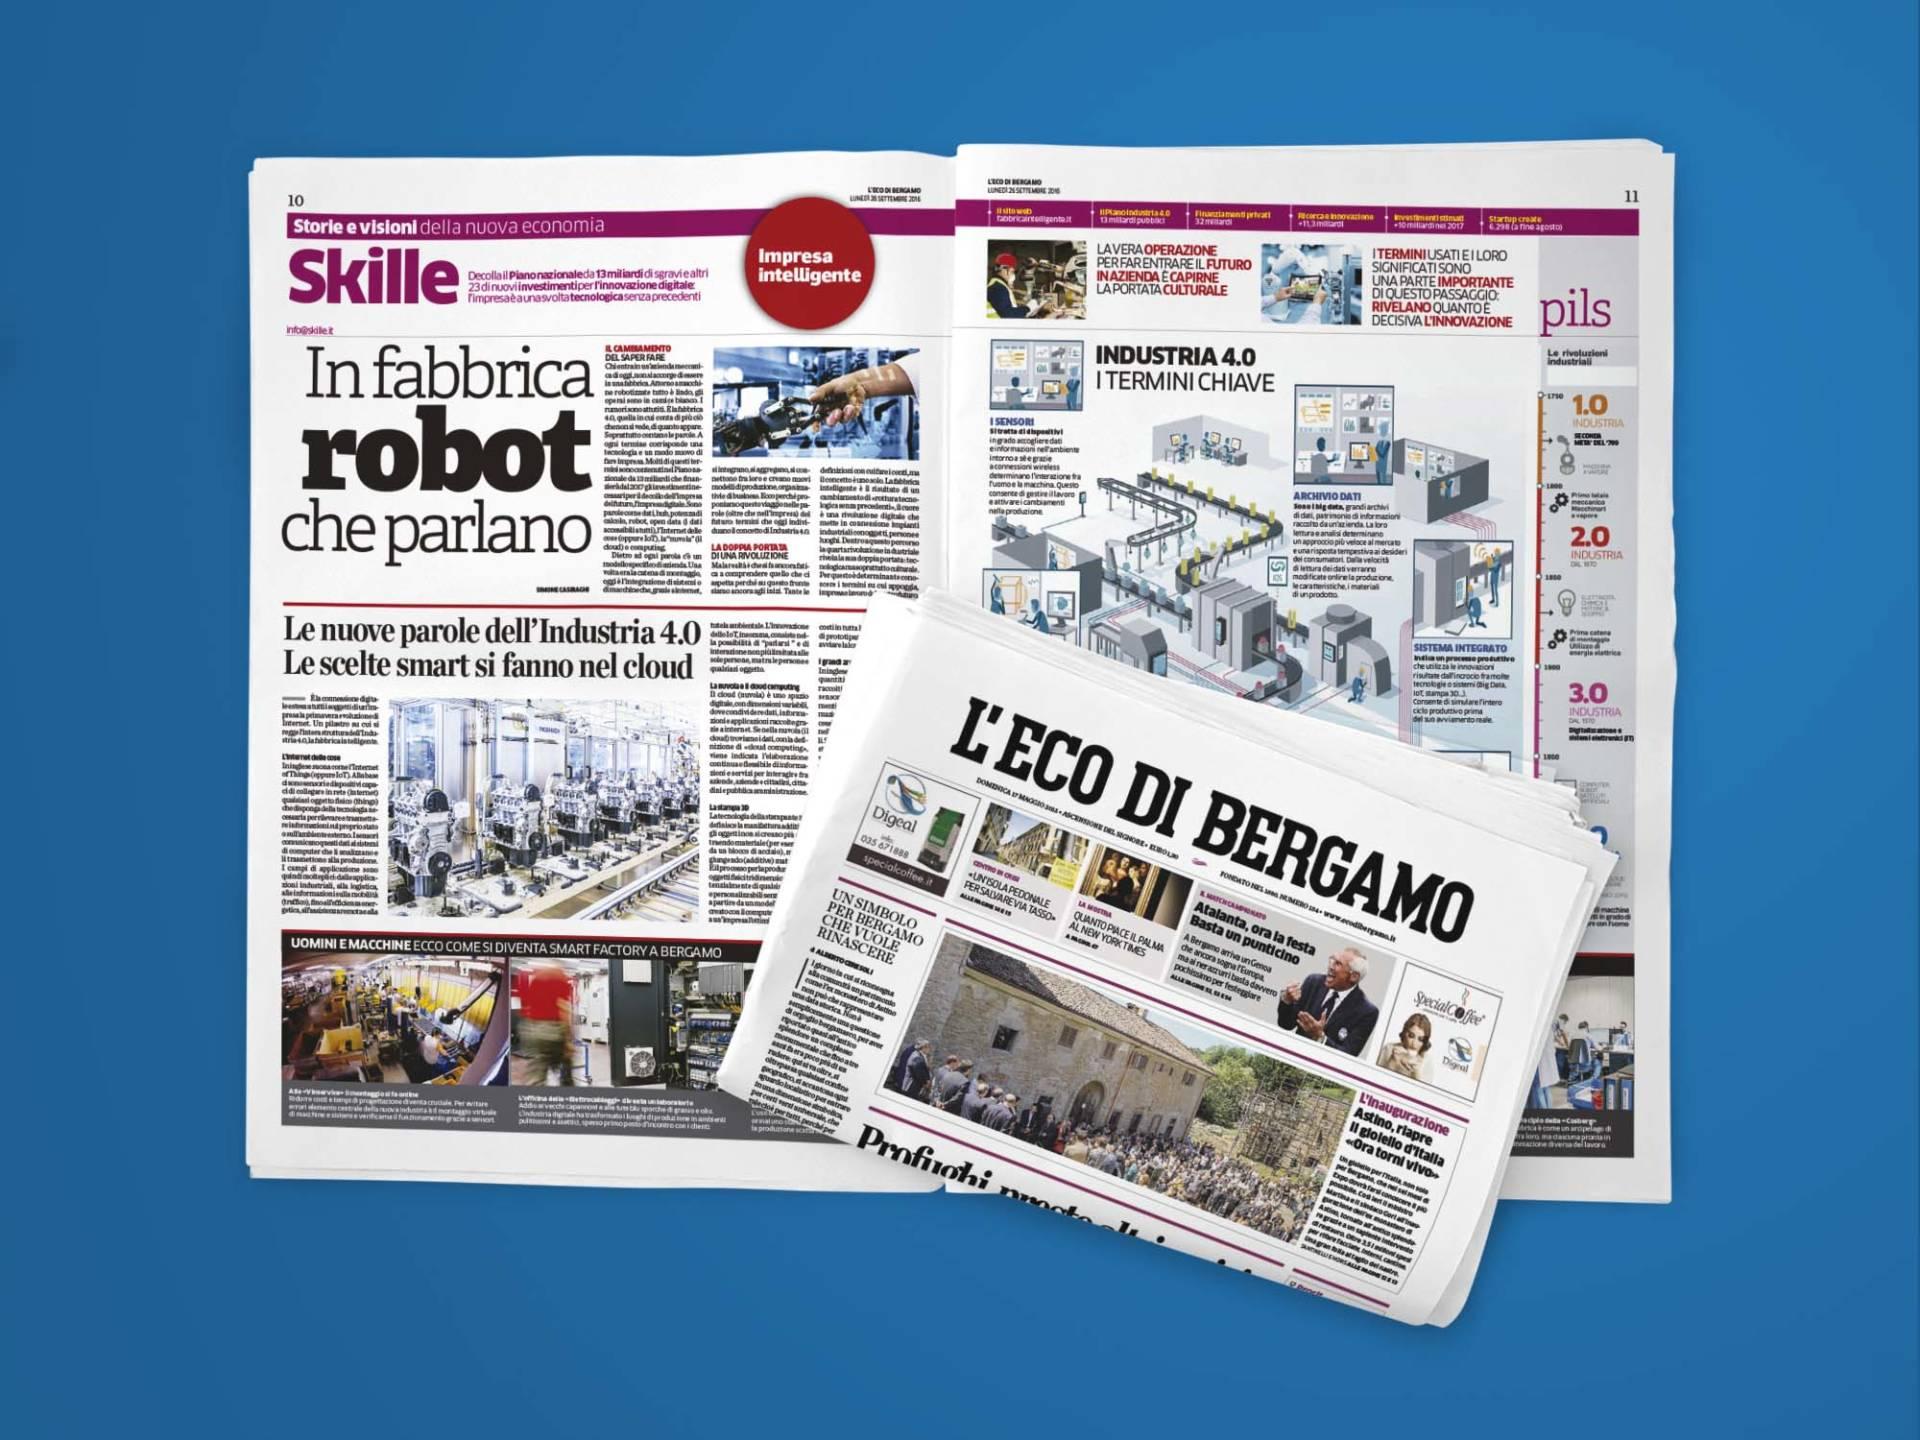 Skille_– L'Eco_di_Bergamo_01_Wenceslau_News_Design